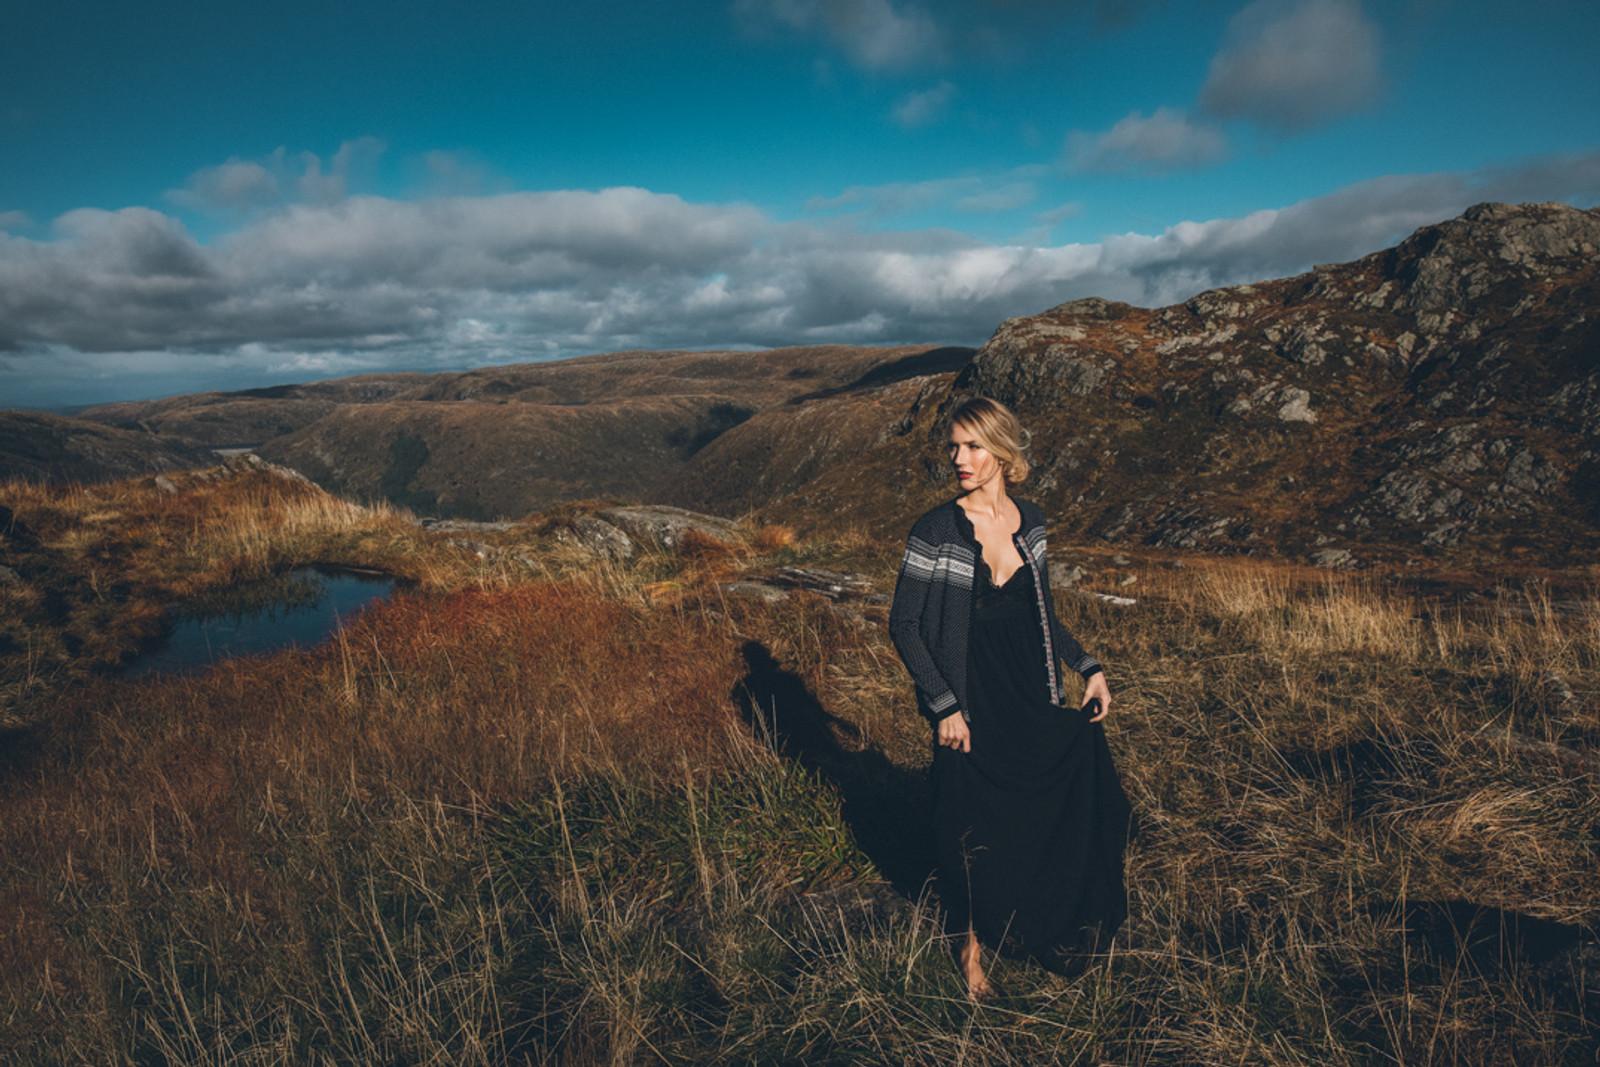 Woman in field wearing Dale of Norway's Hedda Ladies Cardigan in Black/Off White/Ruby Mel, 83401-F